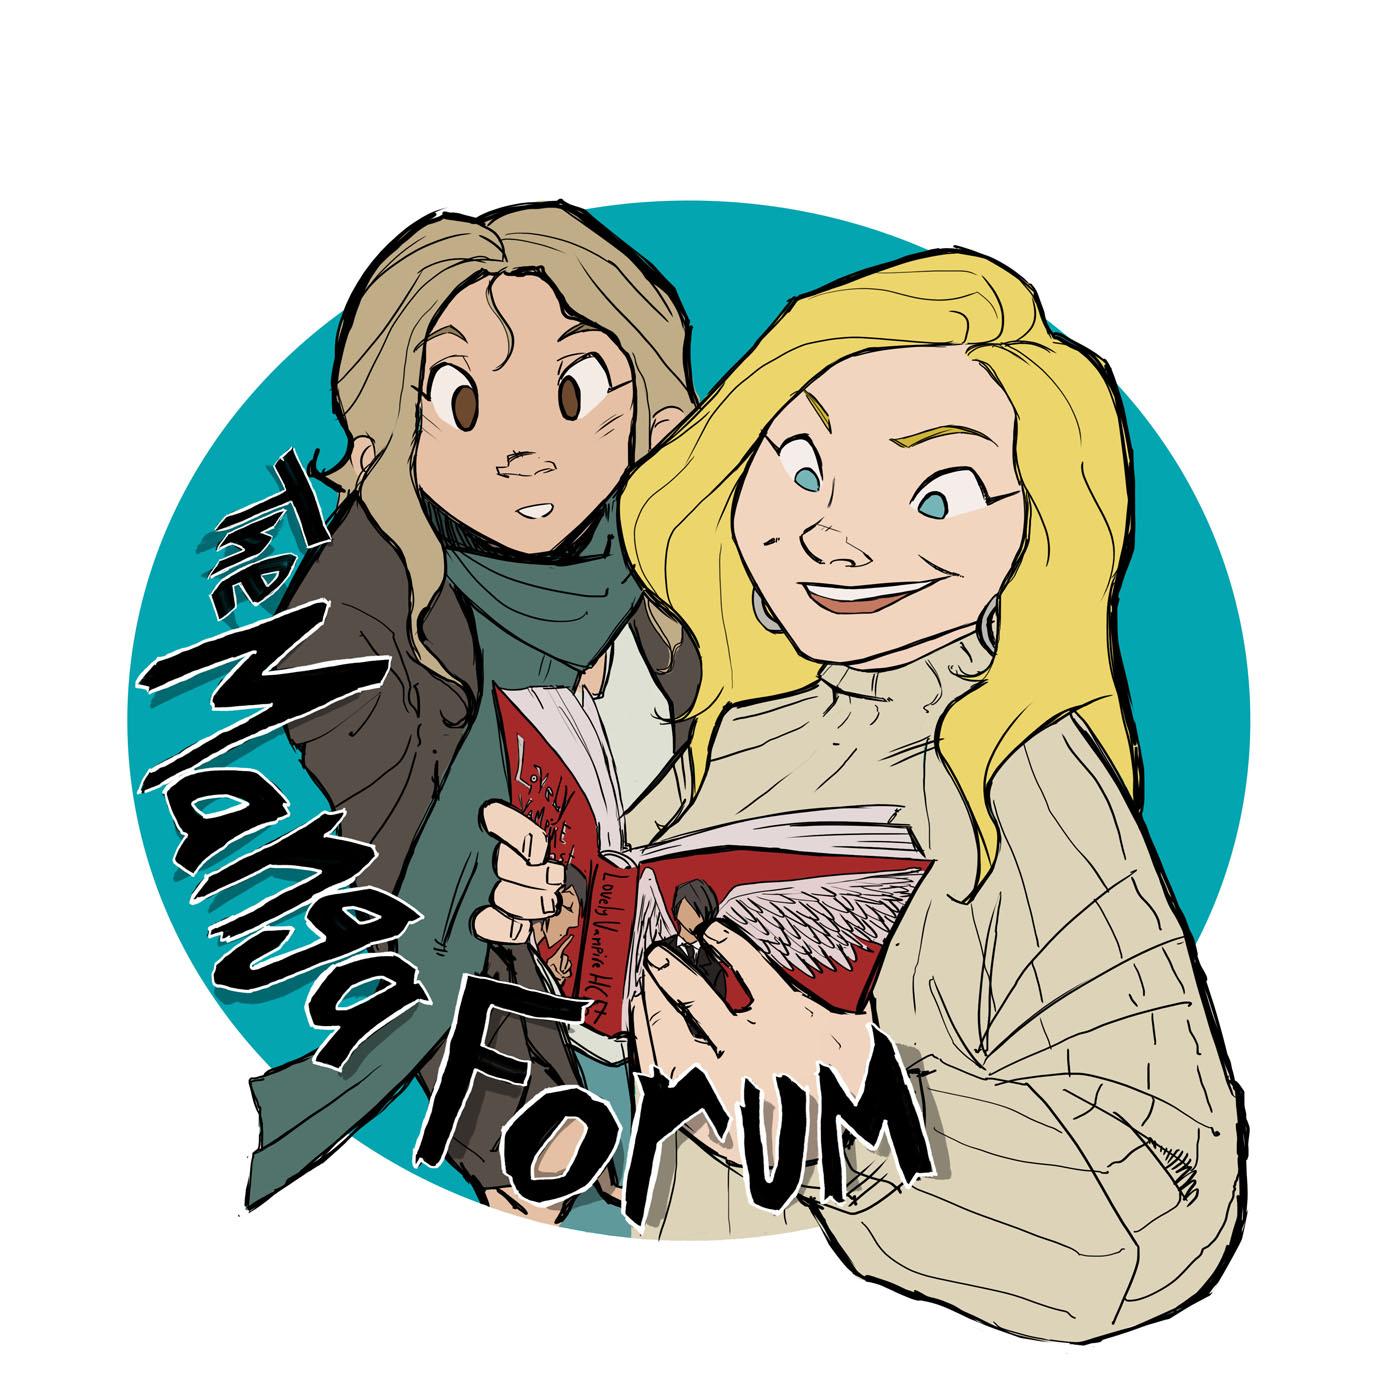 The Manga Forum show art